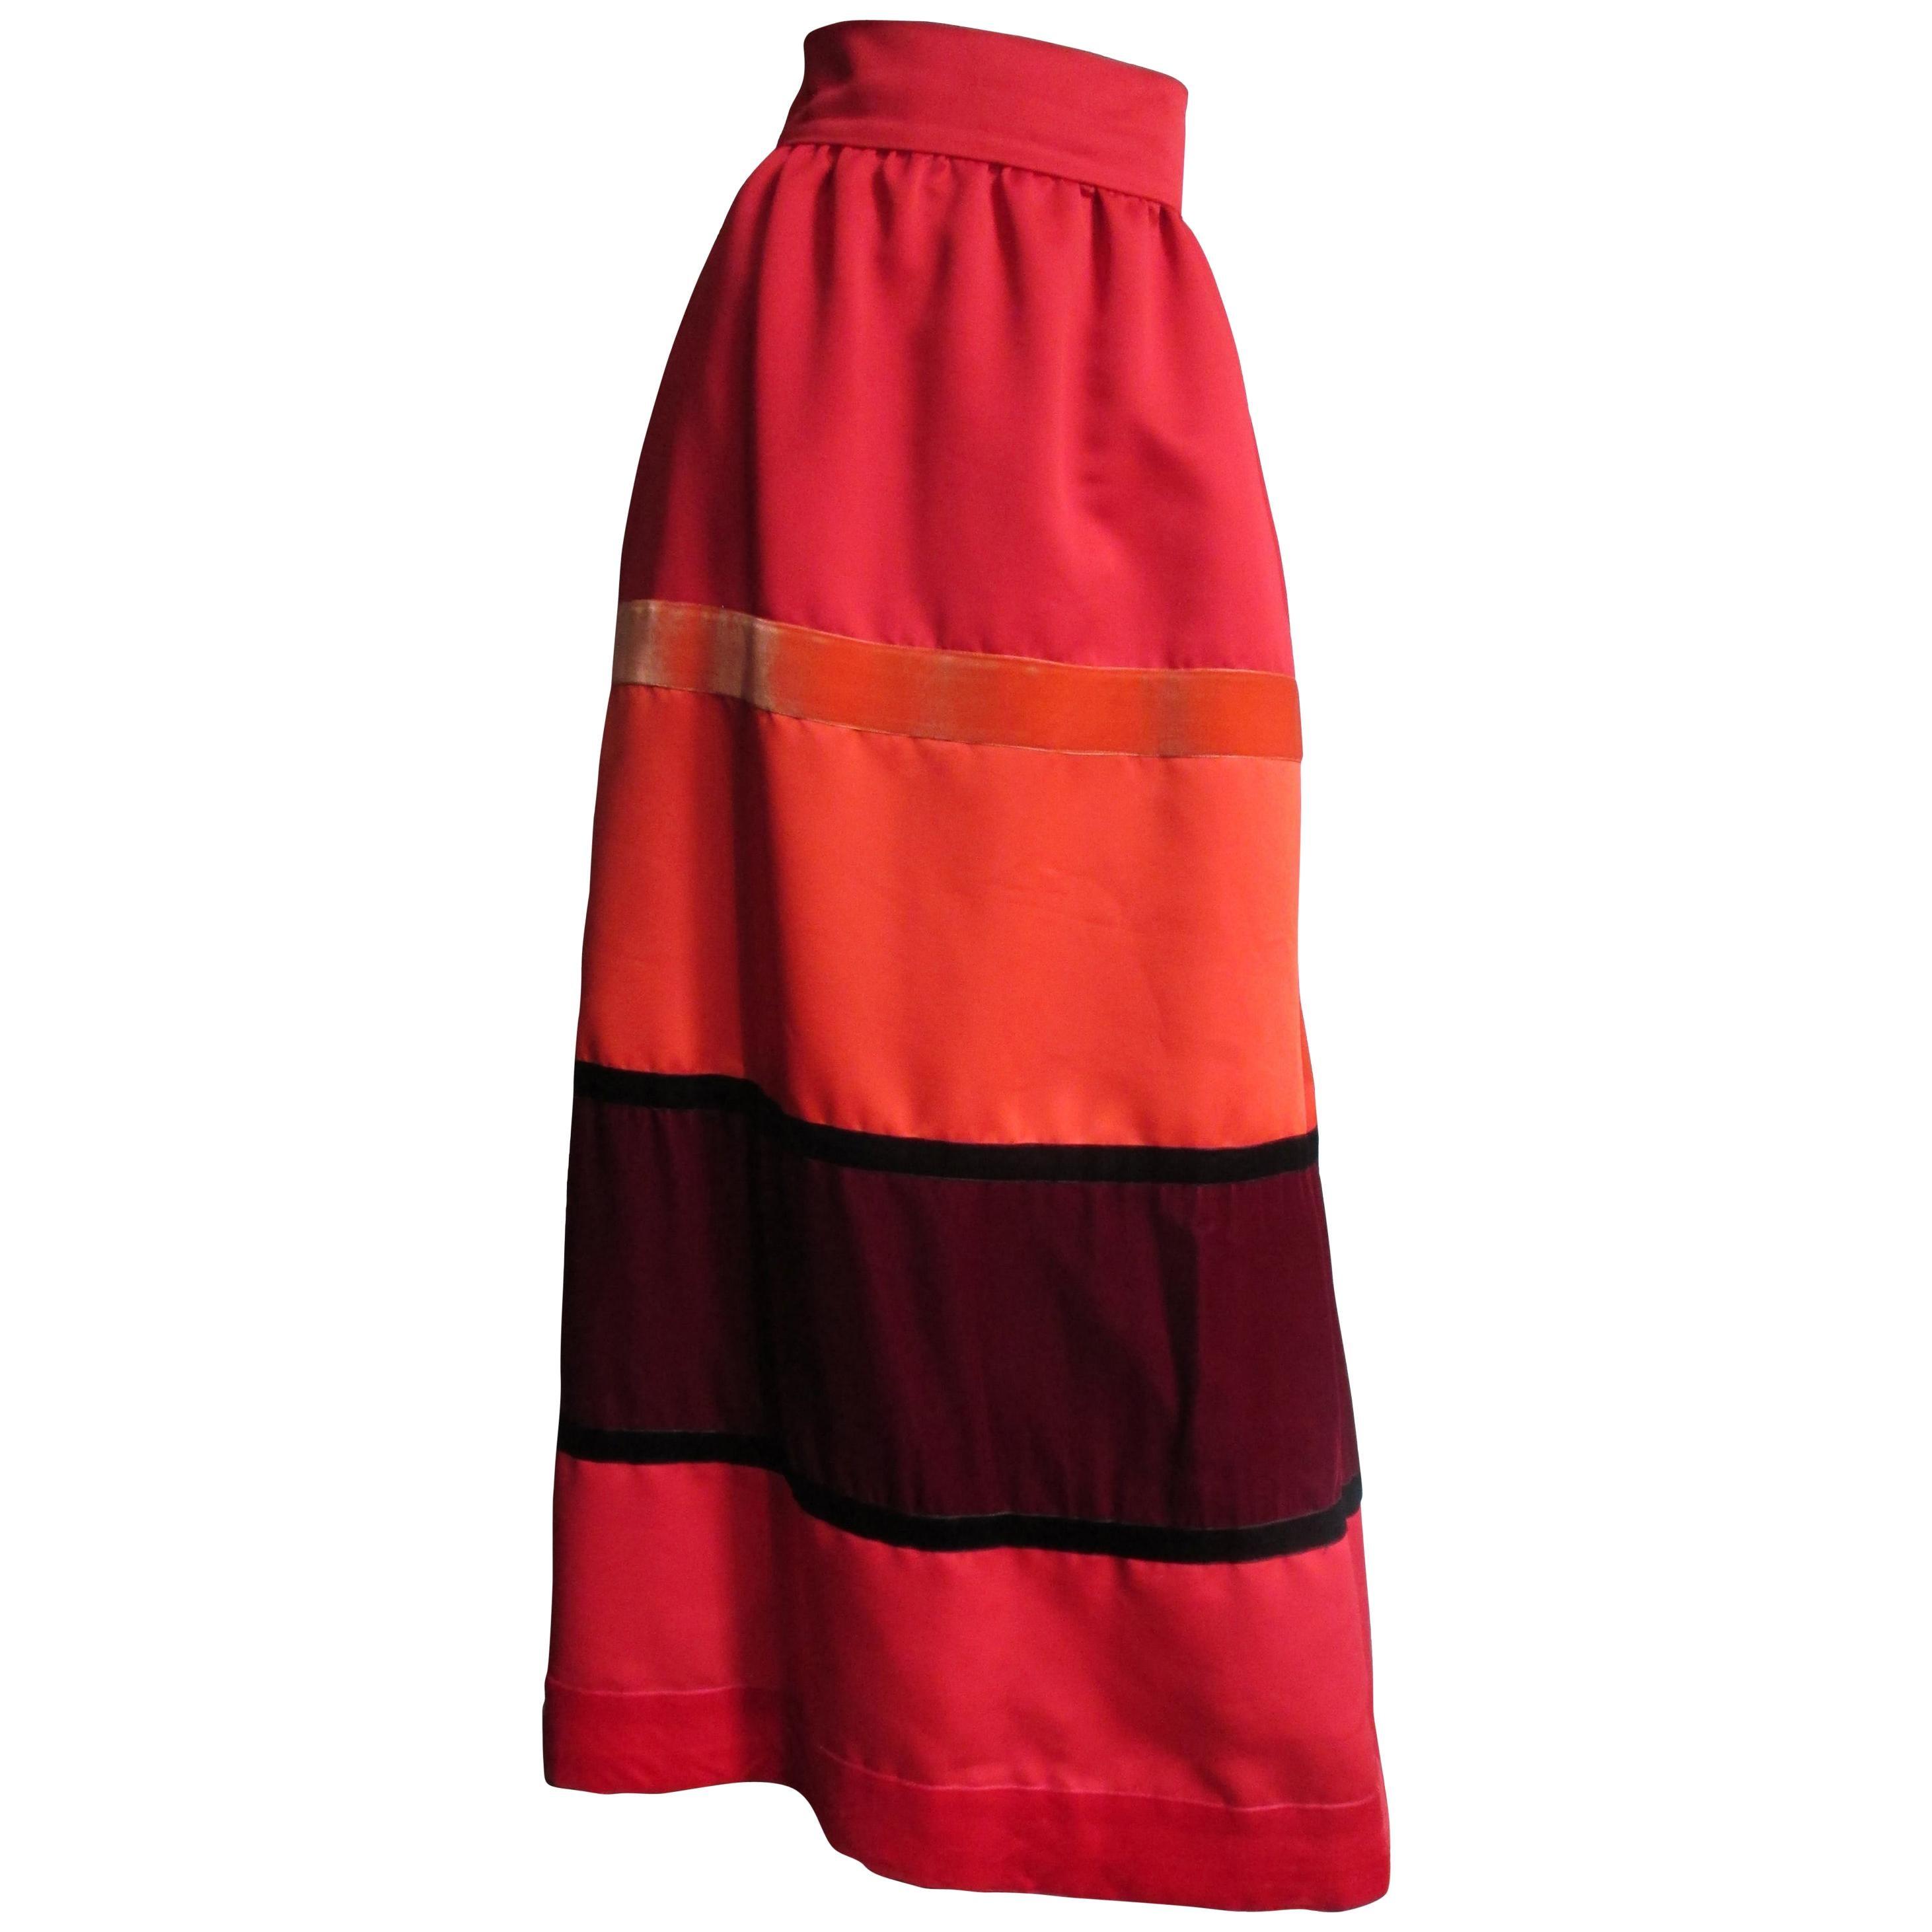 Malcolm Starr Color Block Maxi Skirt 1970s